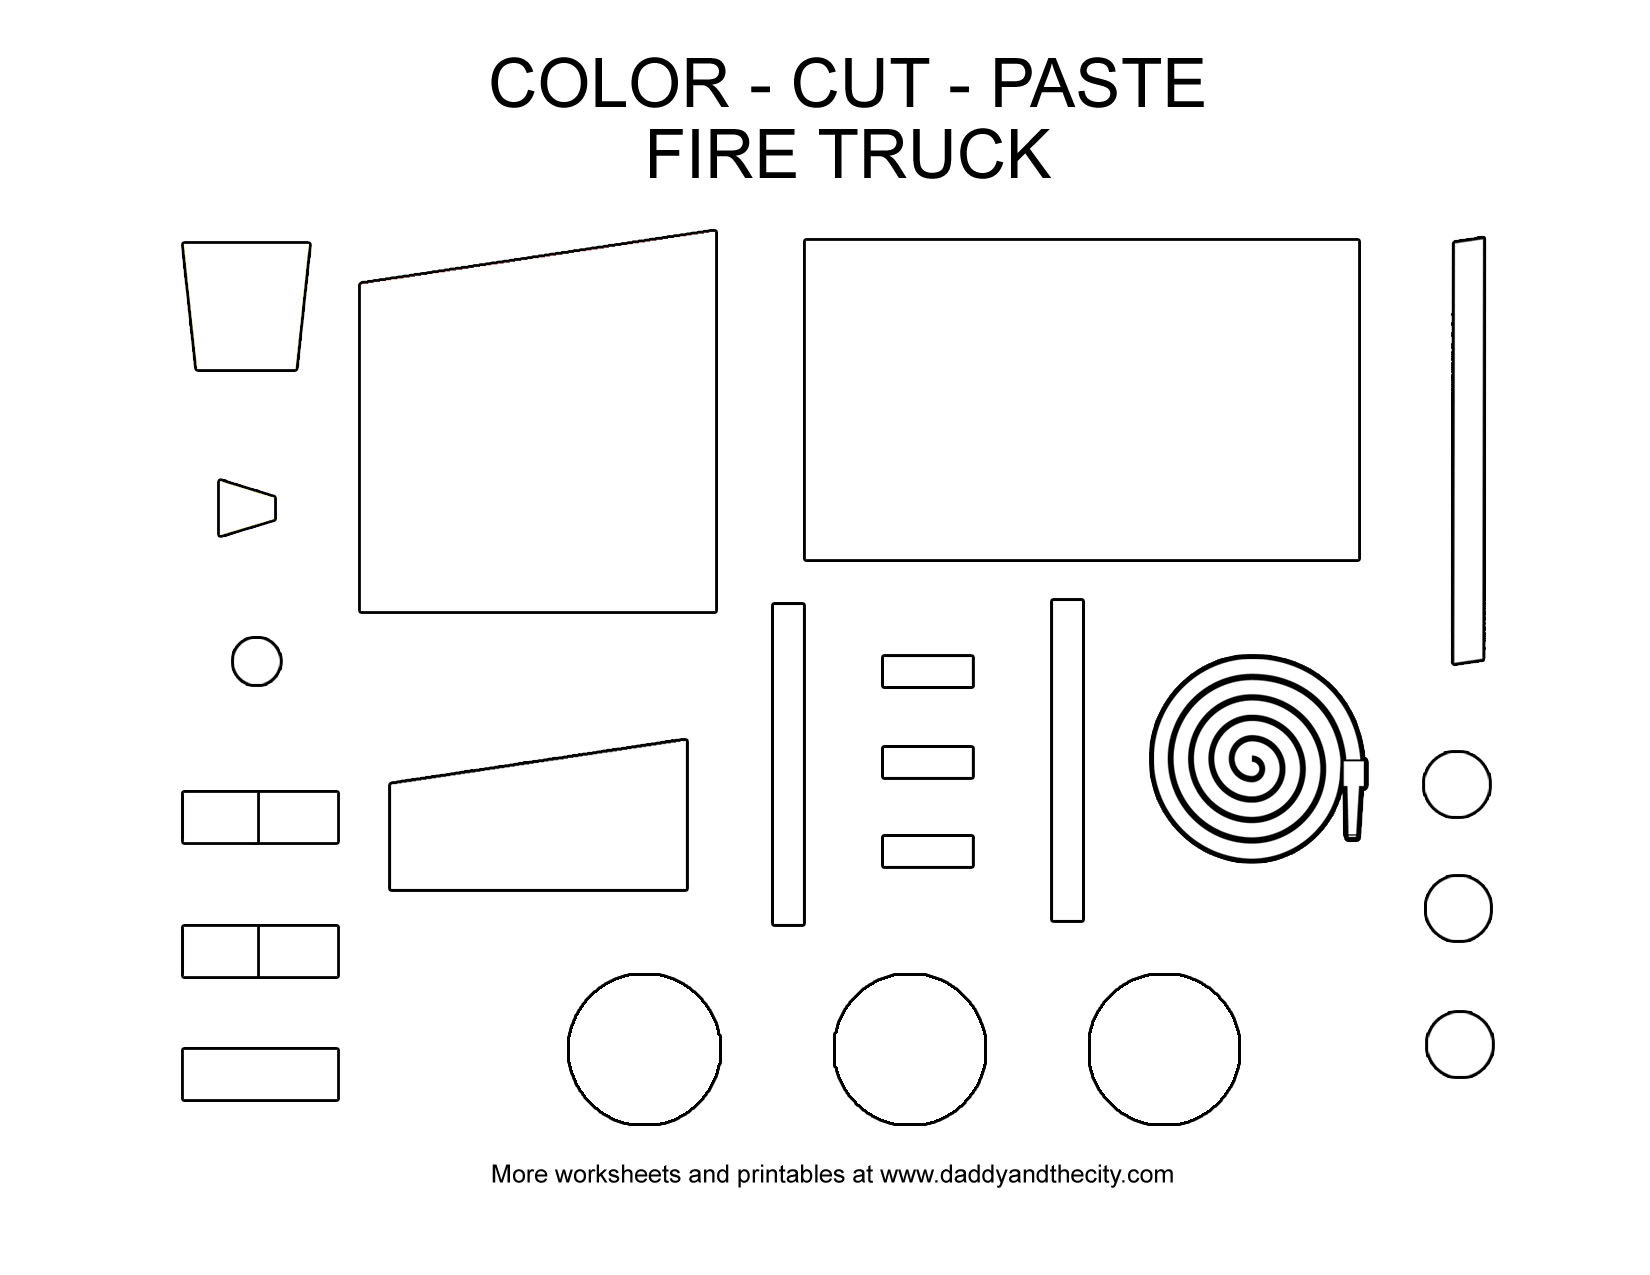 VehicleThemed ColorCutPaste